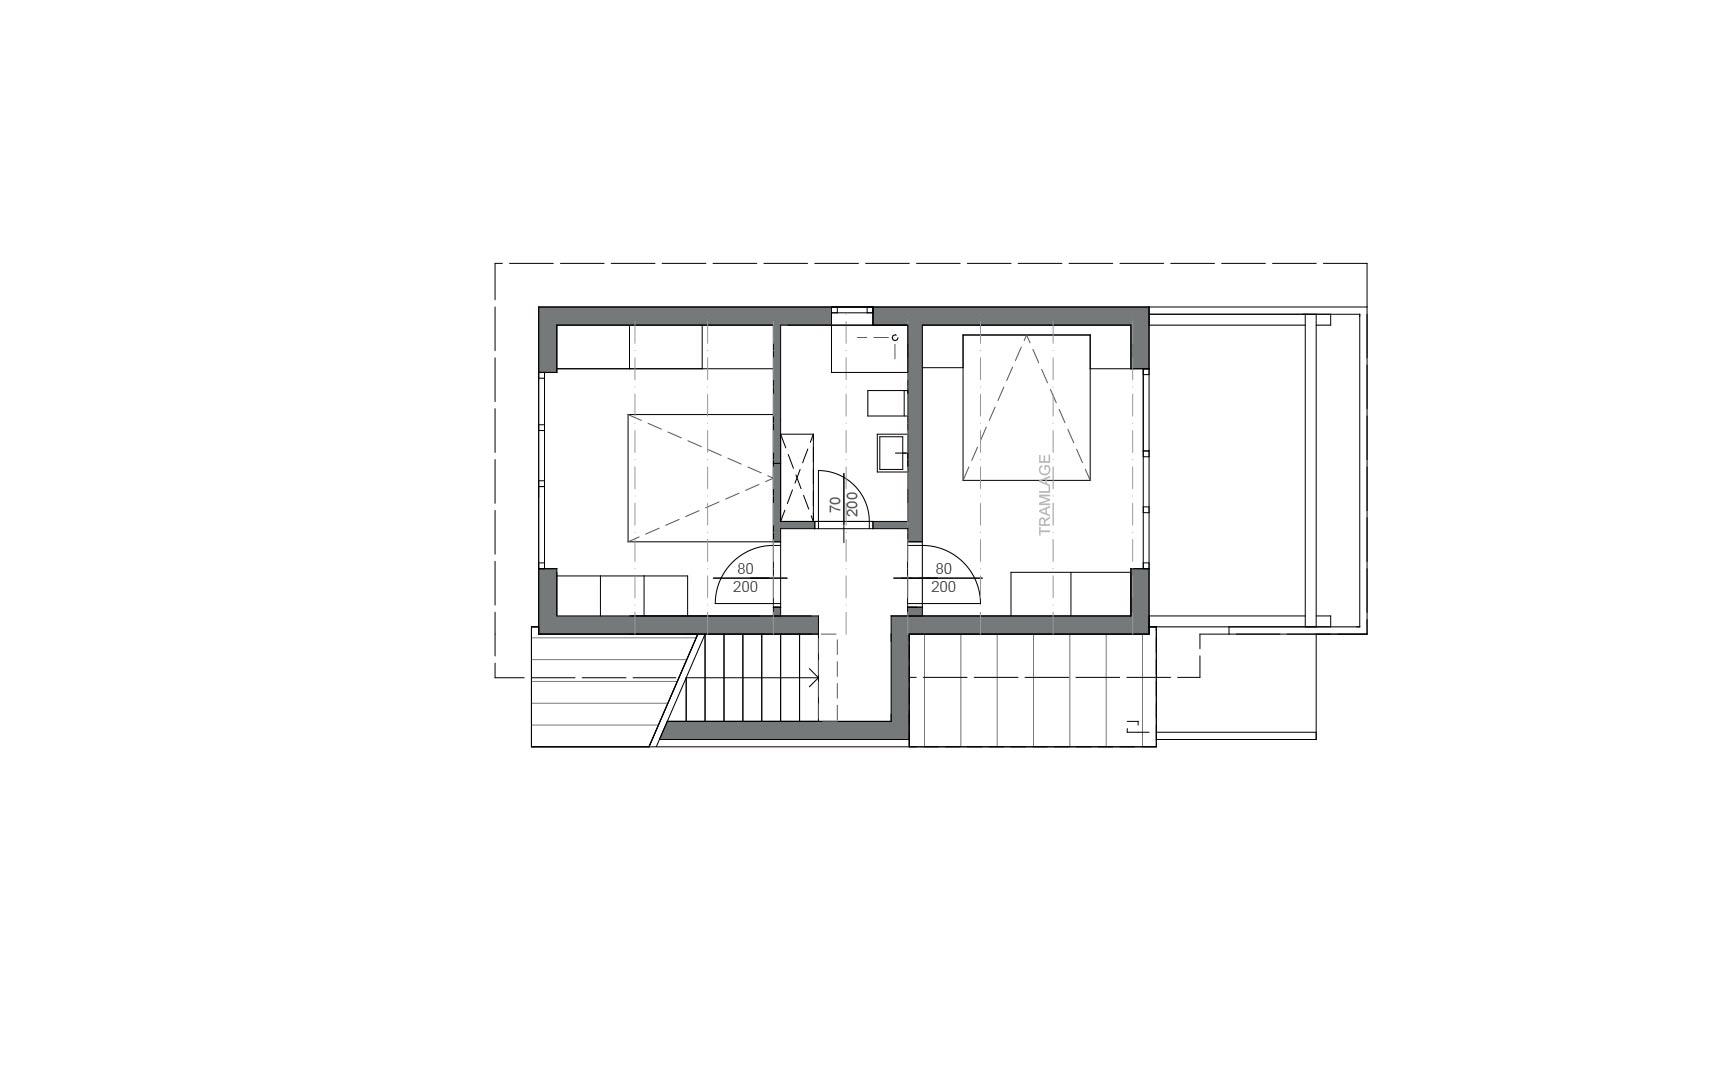 Grundriss 2 / Almdorf-Goldeck